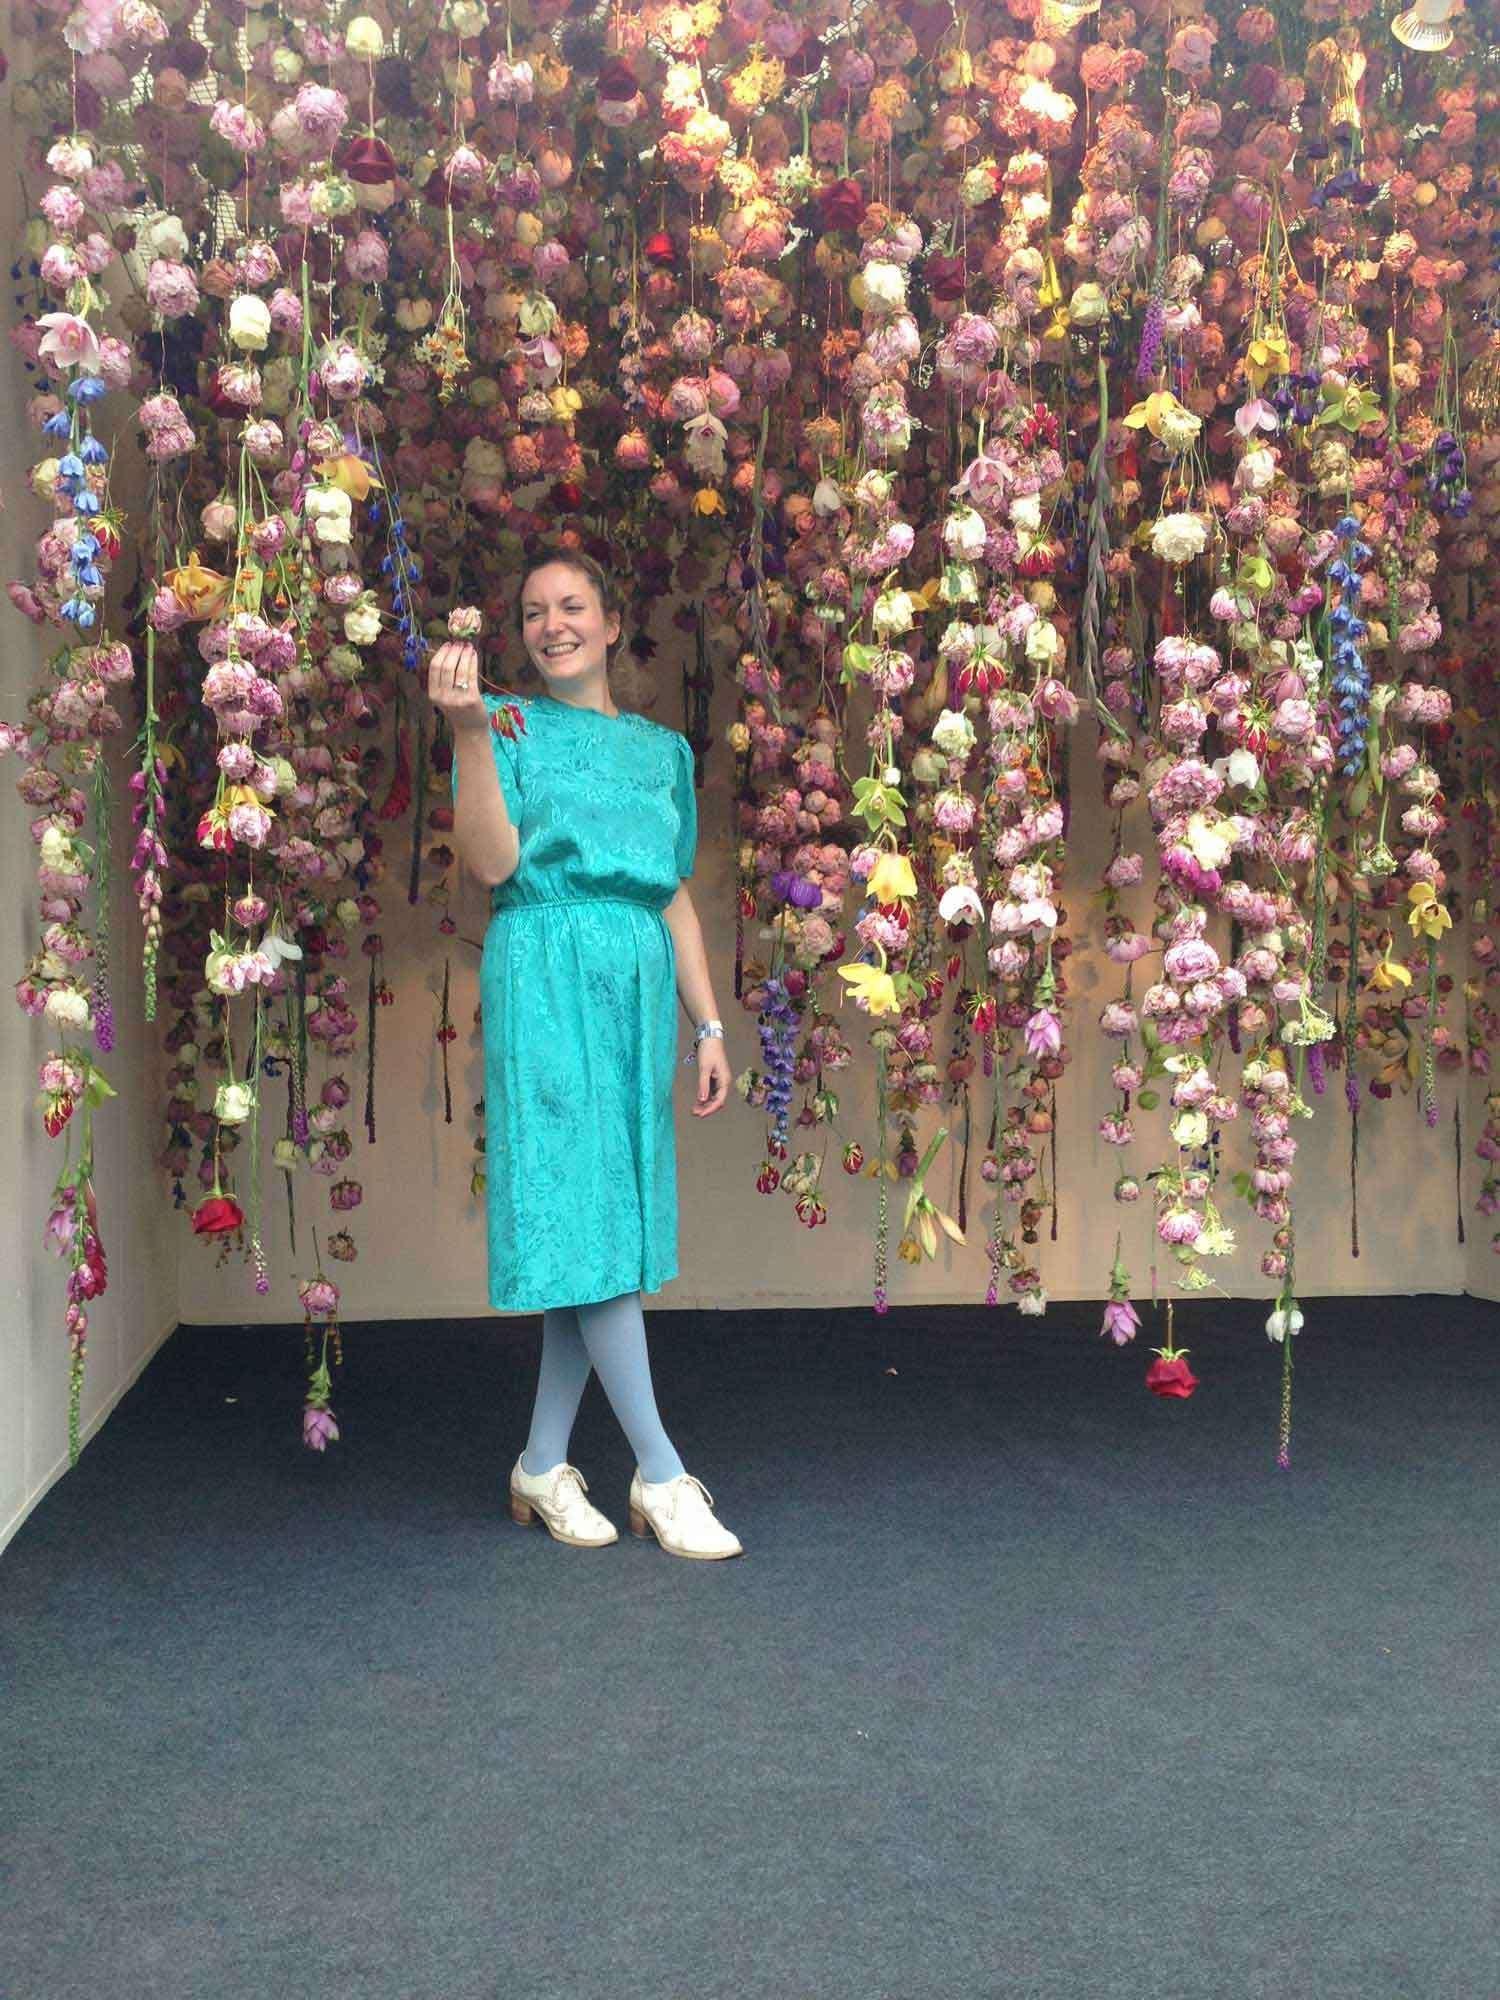 Decoracion Con Flores, Flores Colgantes